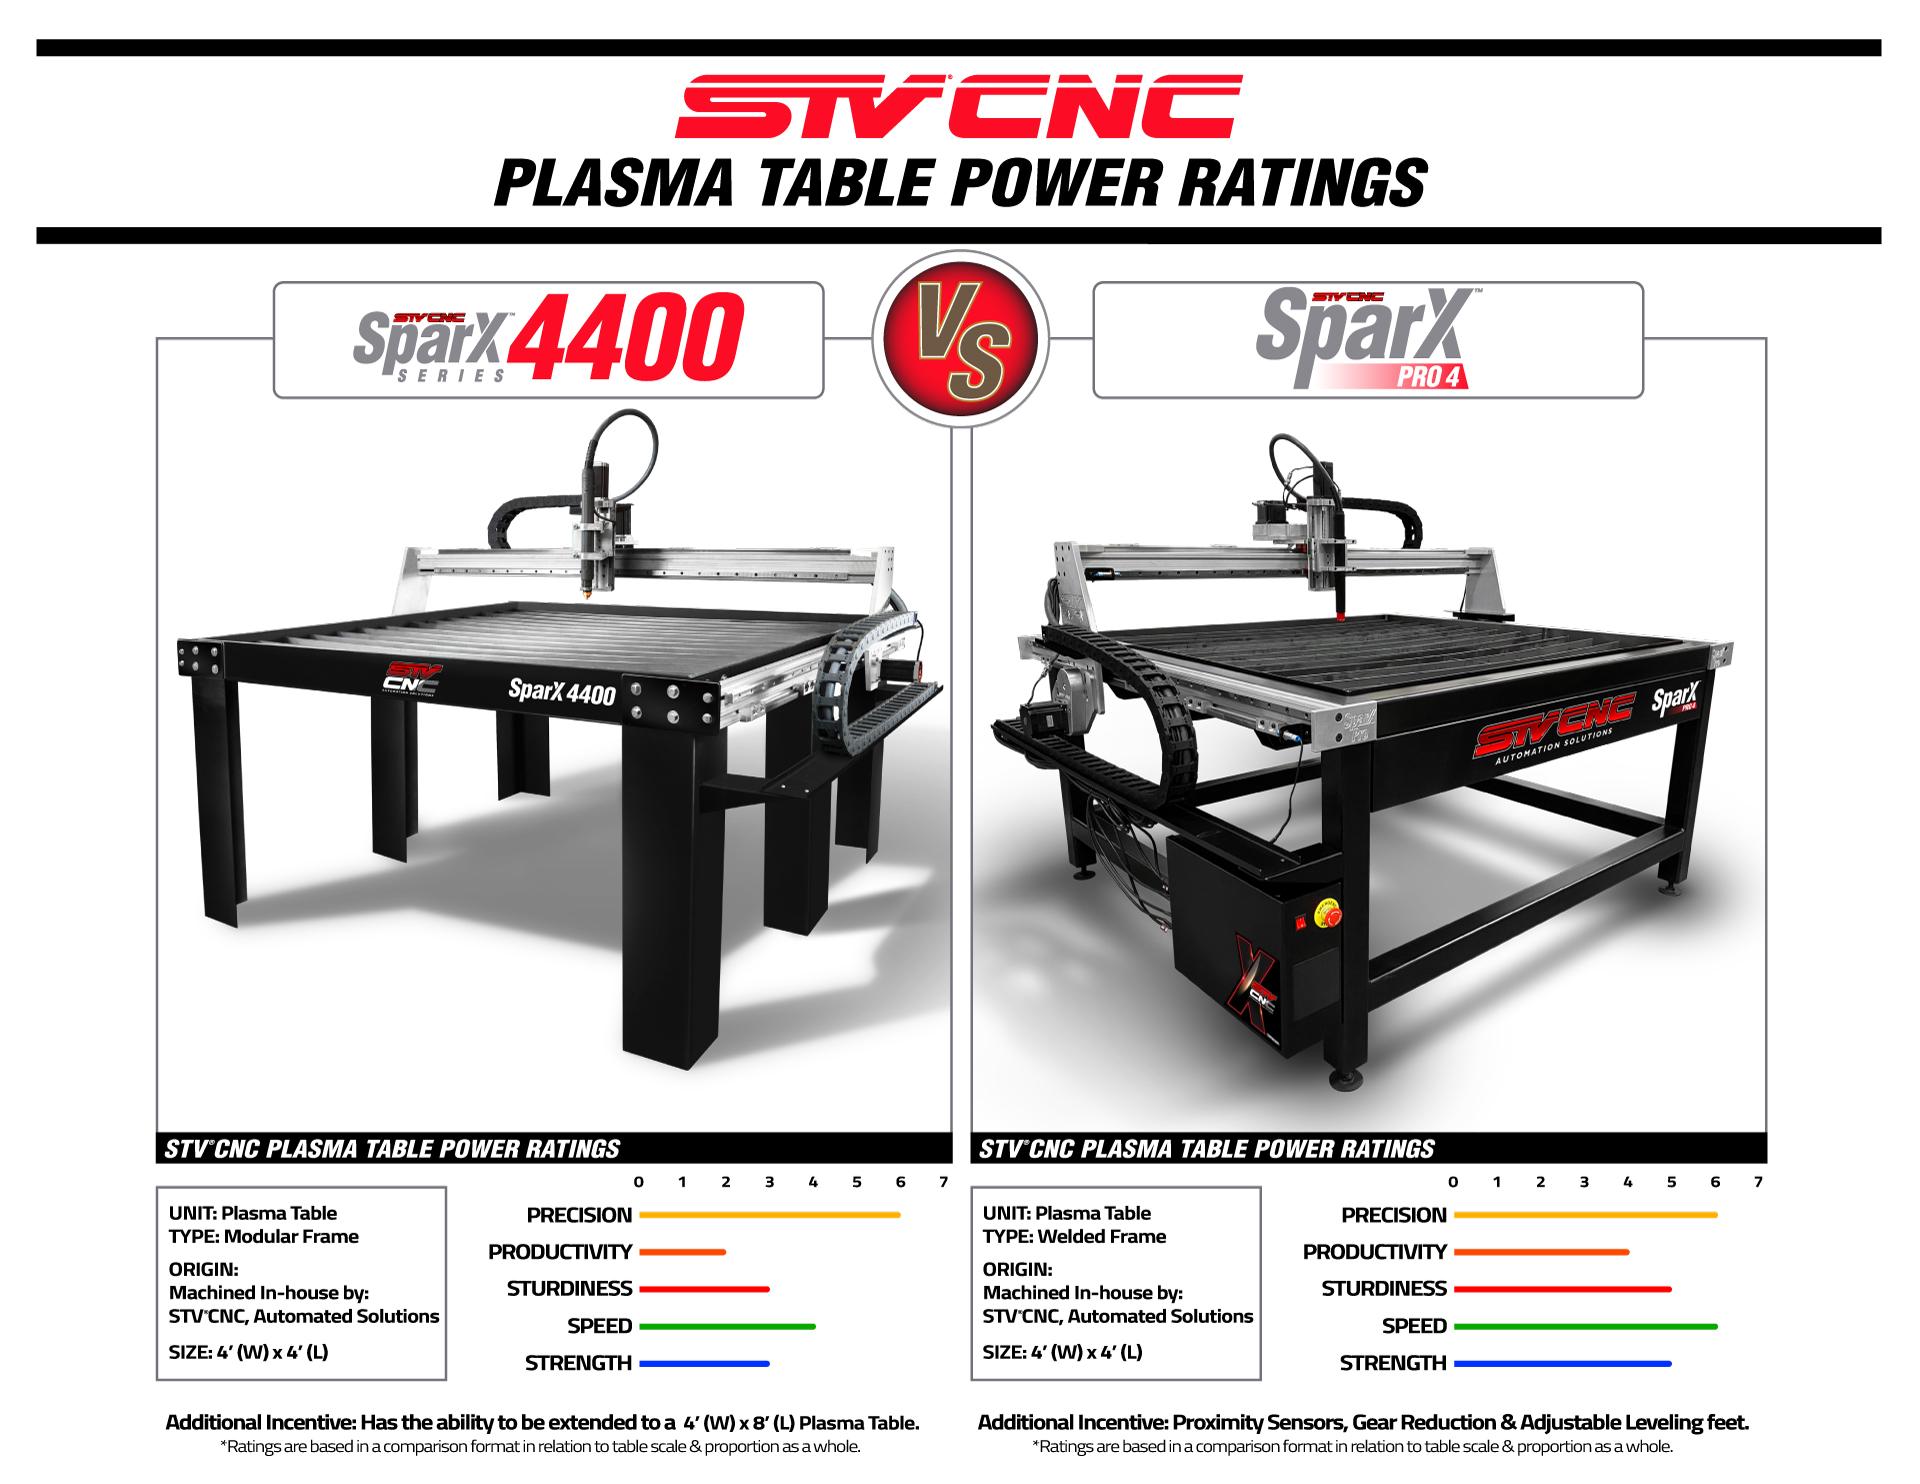 STVCNC Plasma Table Power Ratings 4x4